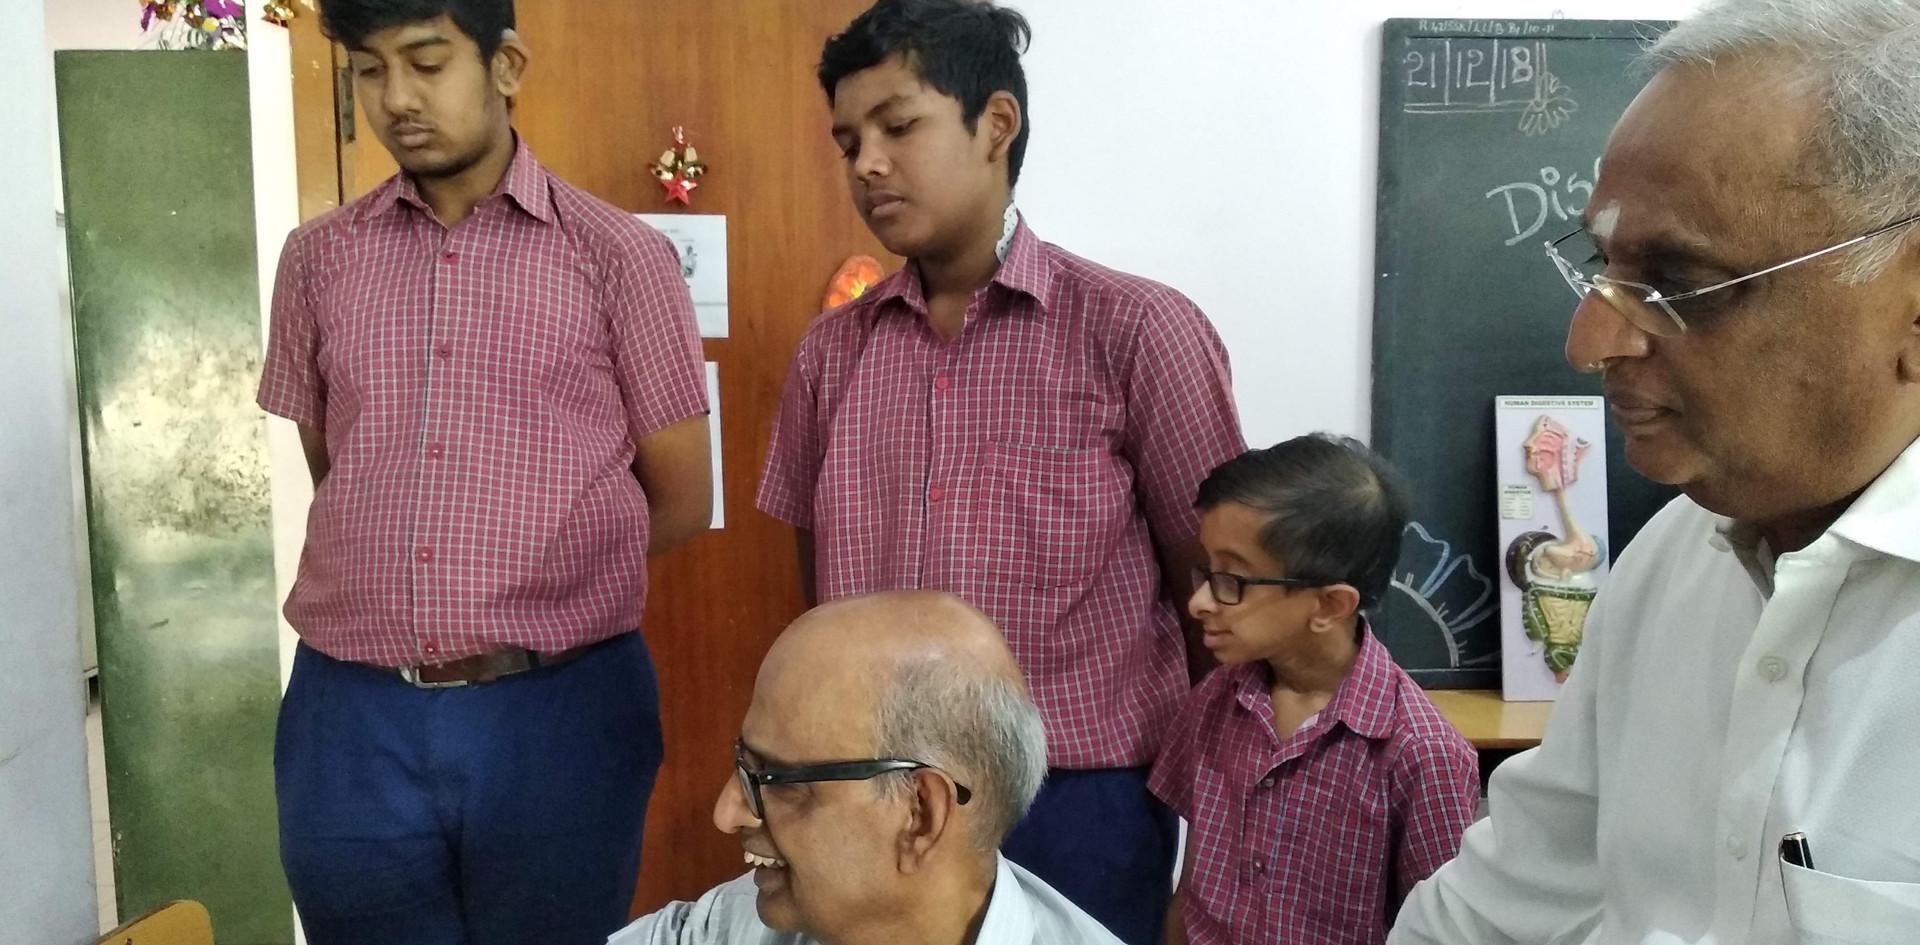 8. Life Member, Govindrajan and Secretar